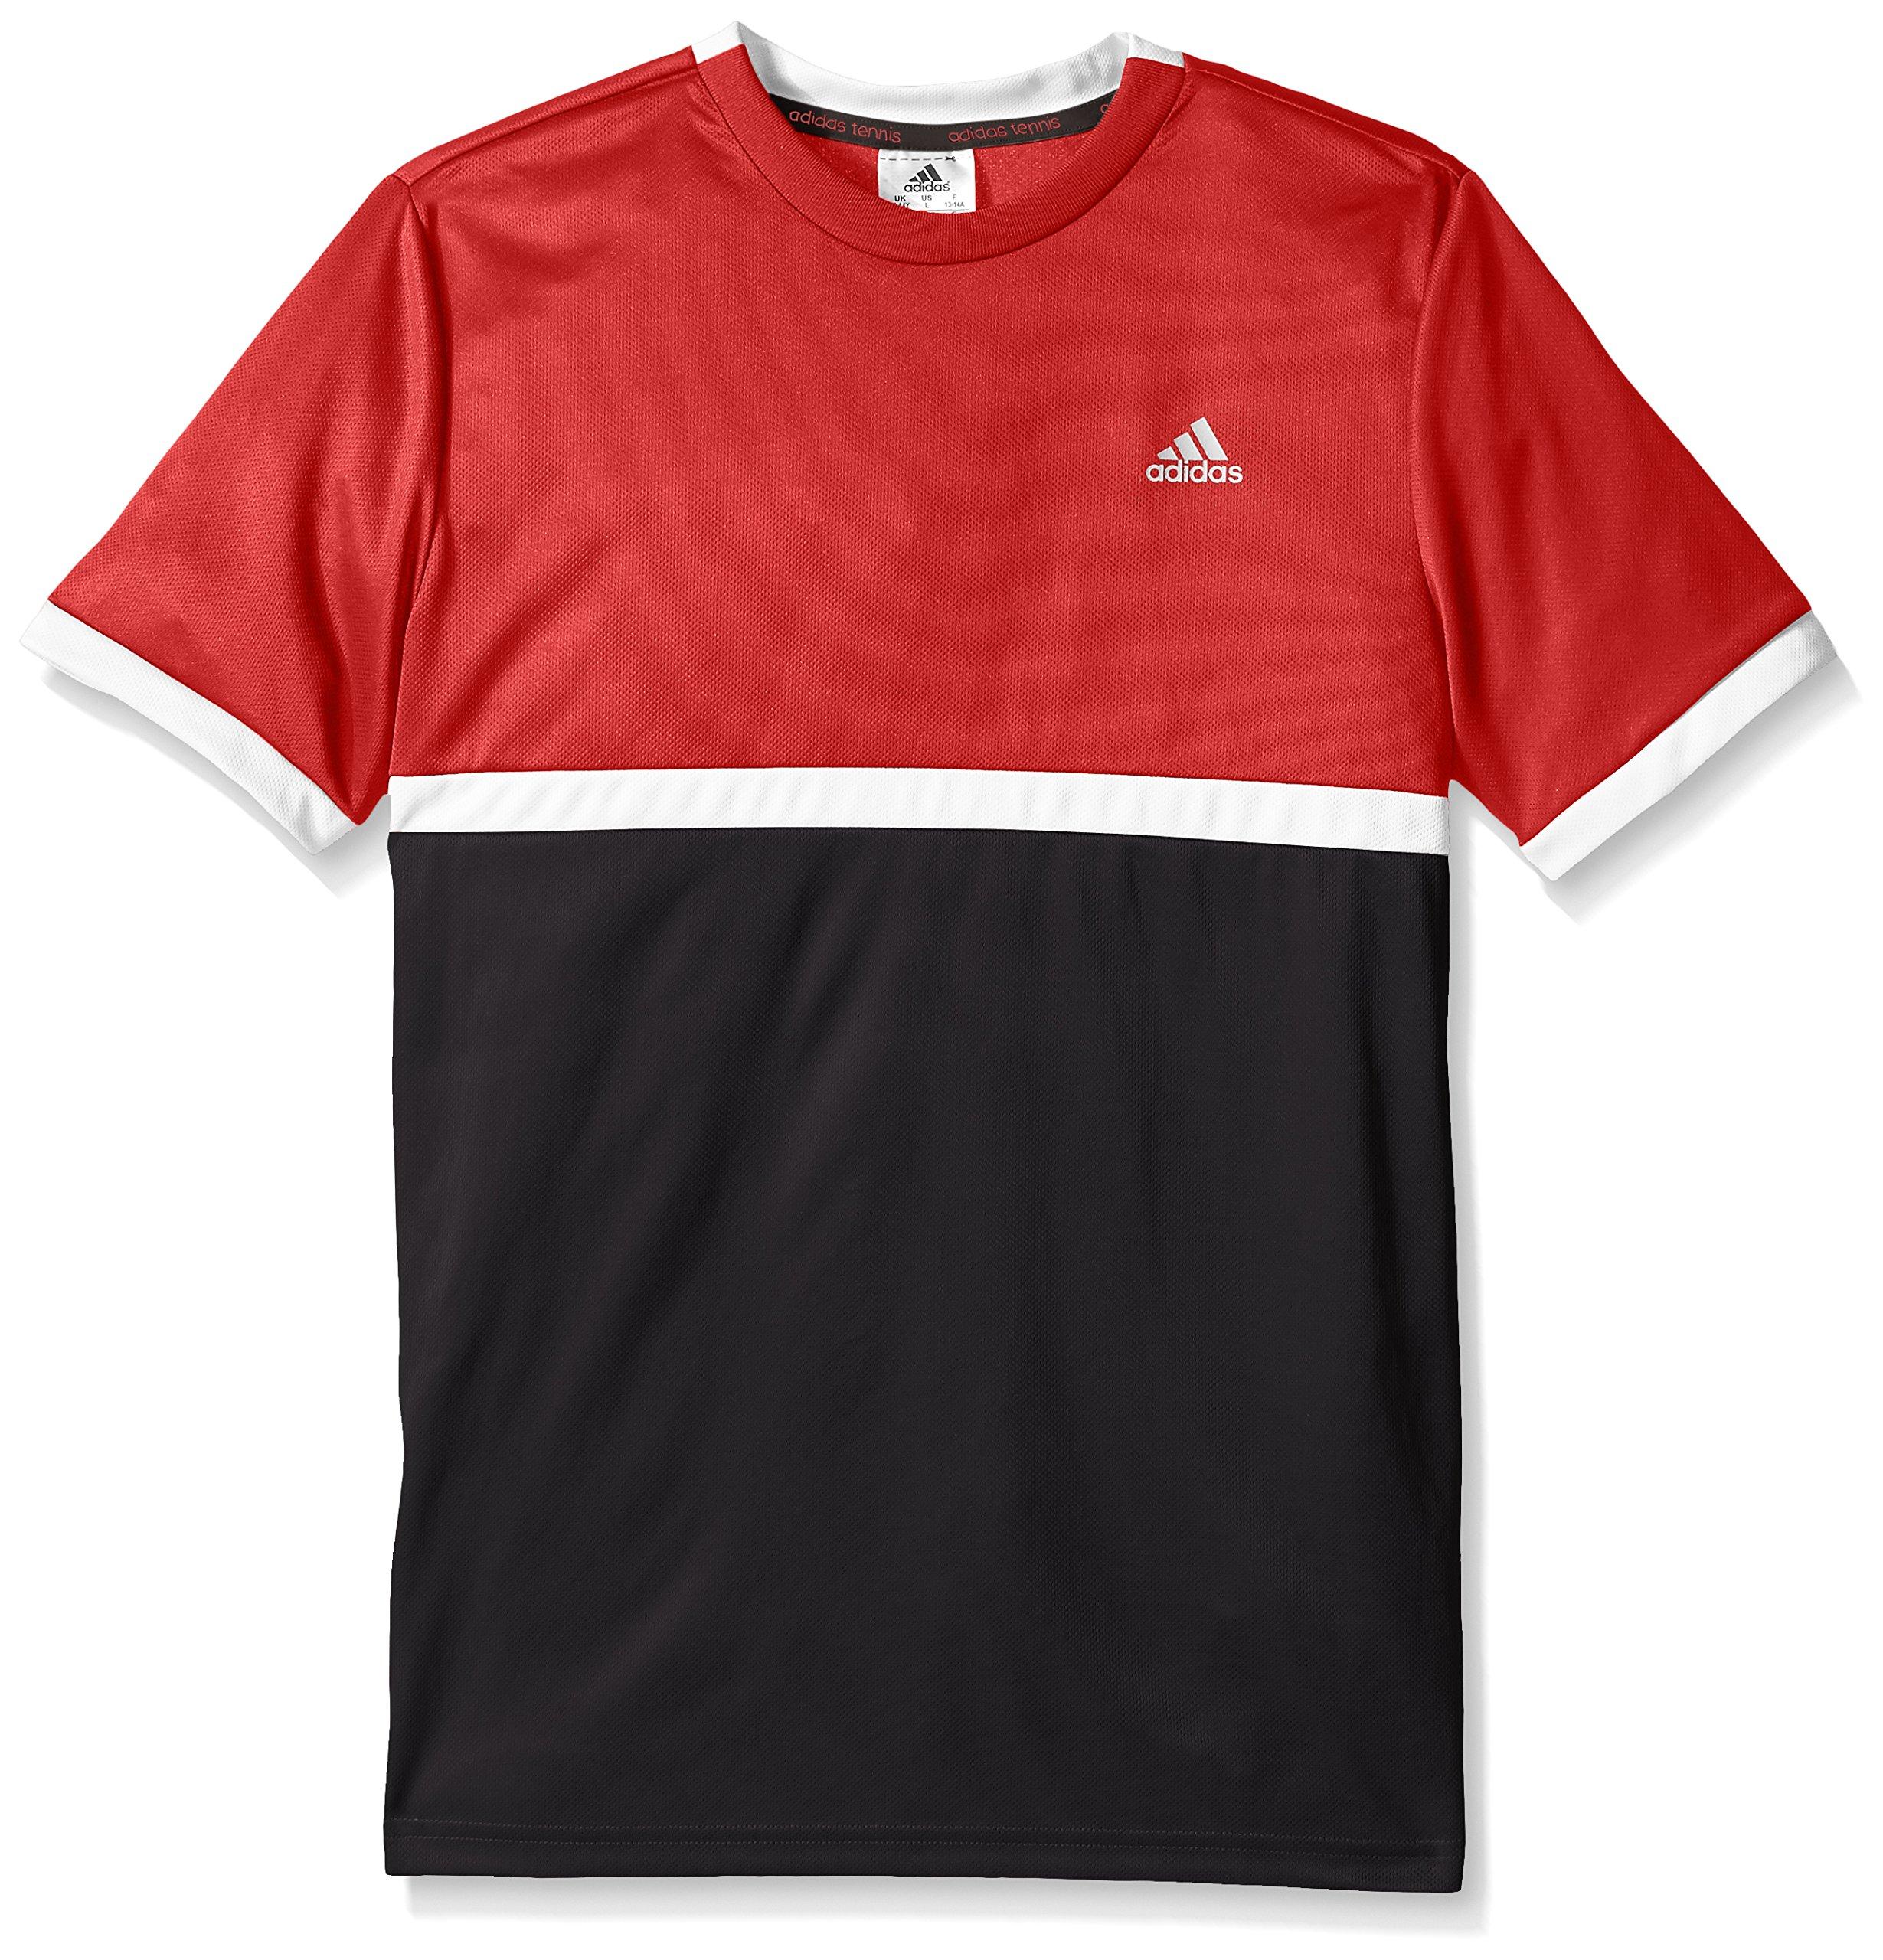 adidas Boys Tennis Court Tee, Scarlet/White/Black, Medium